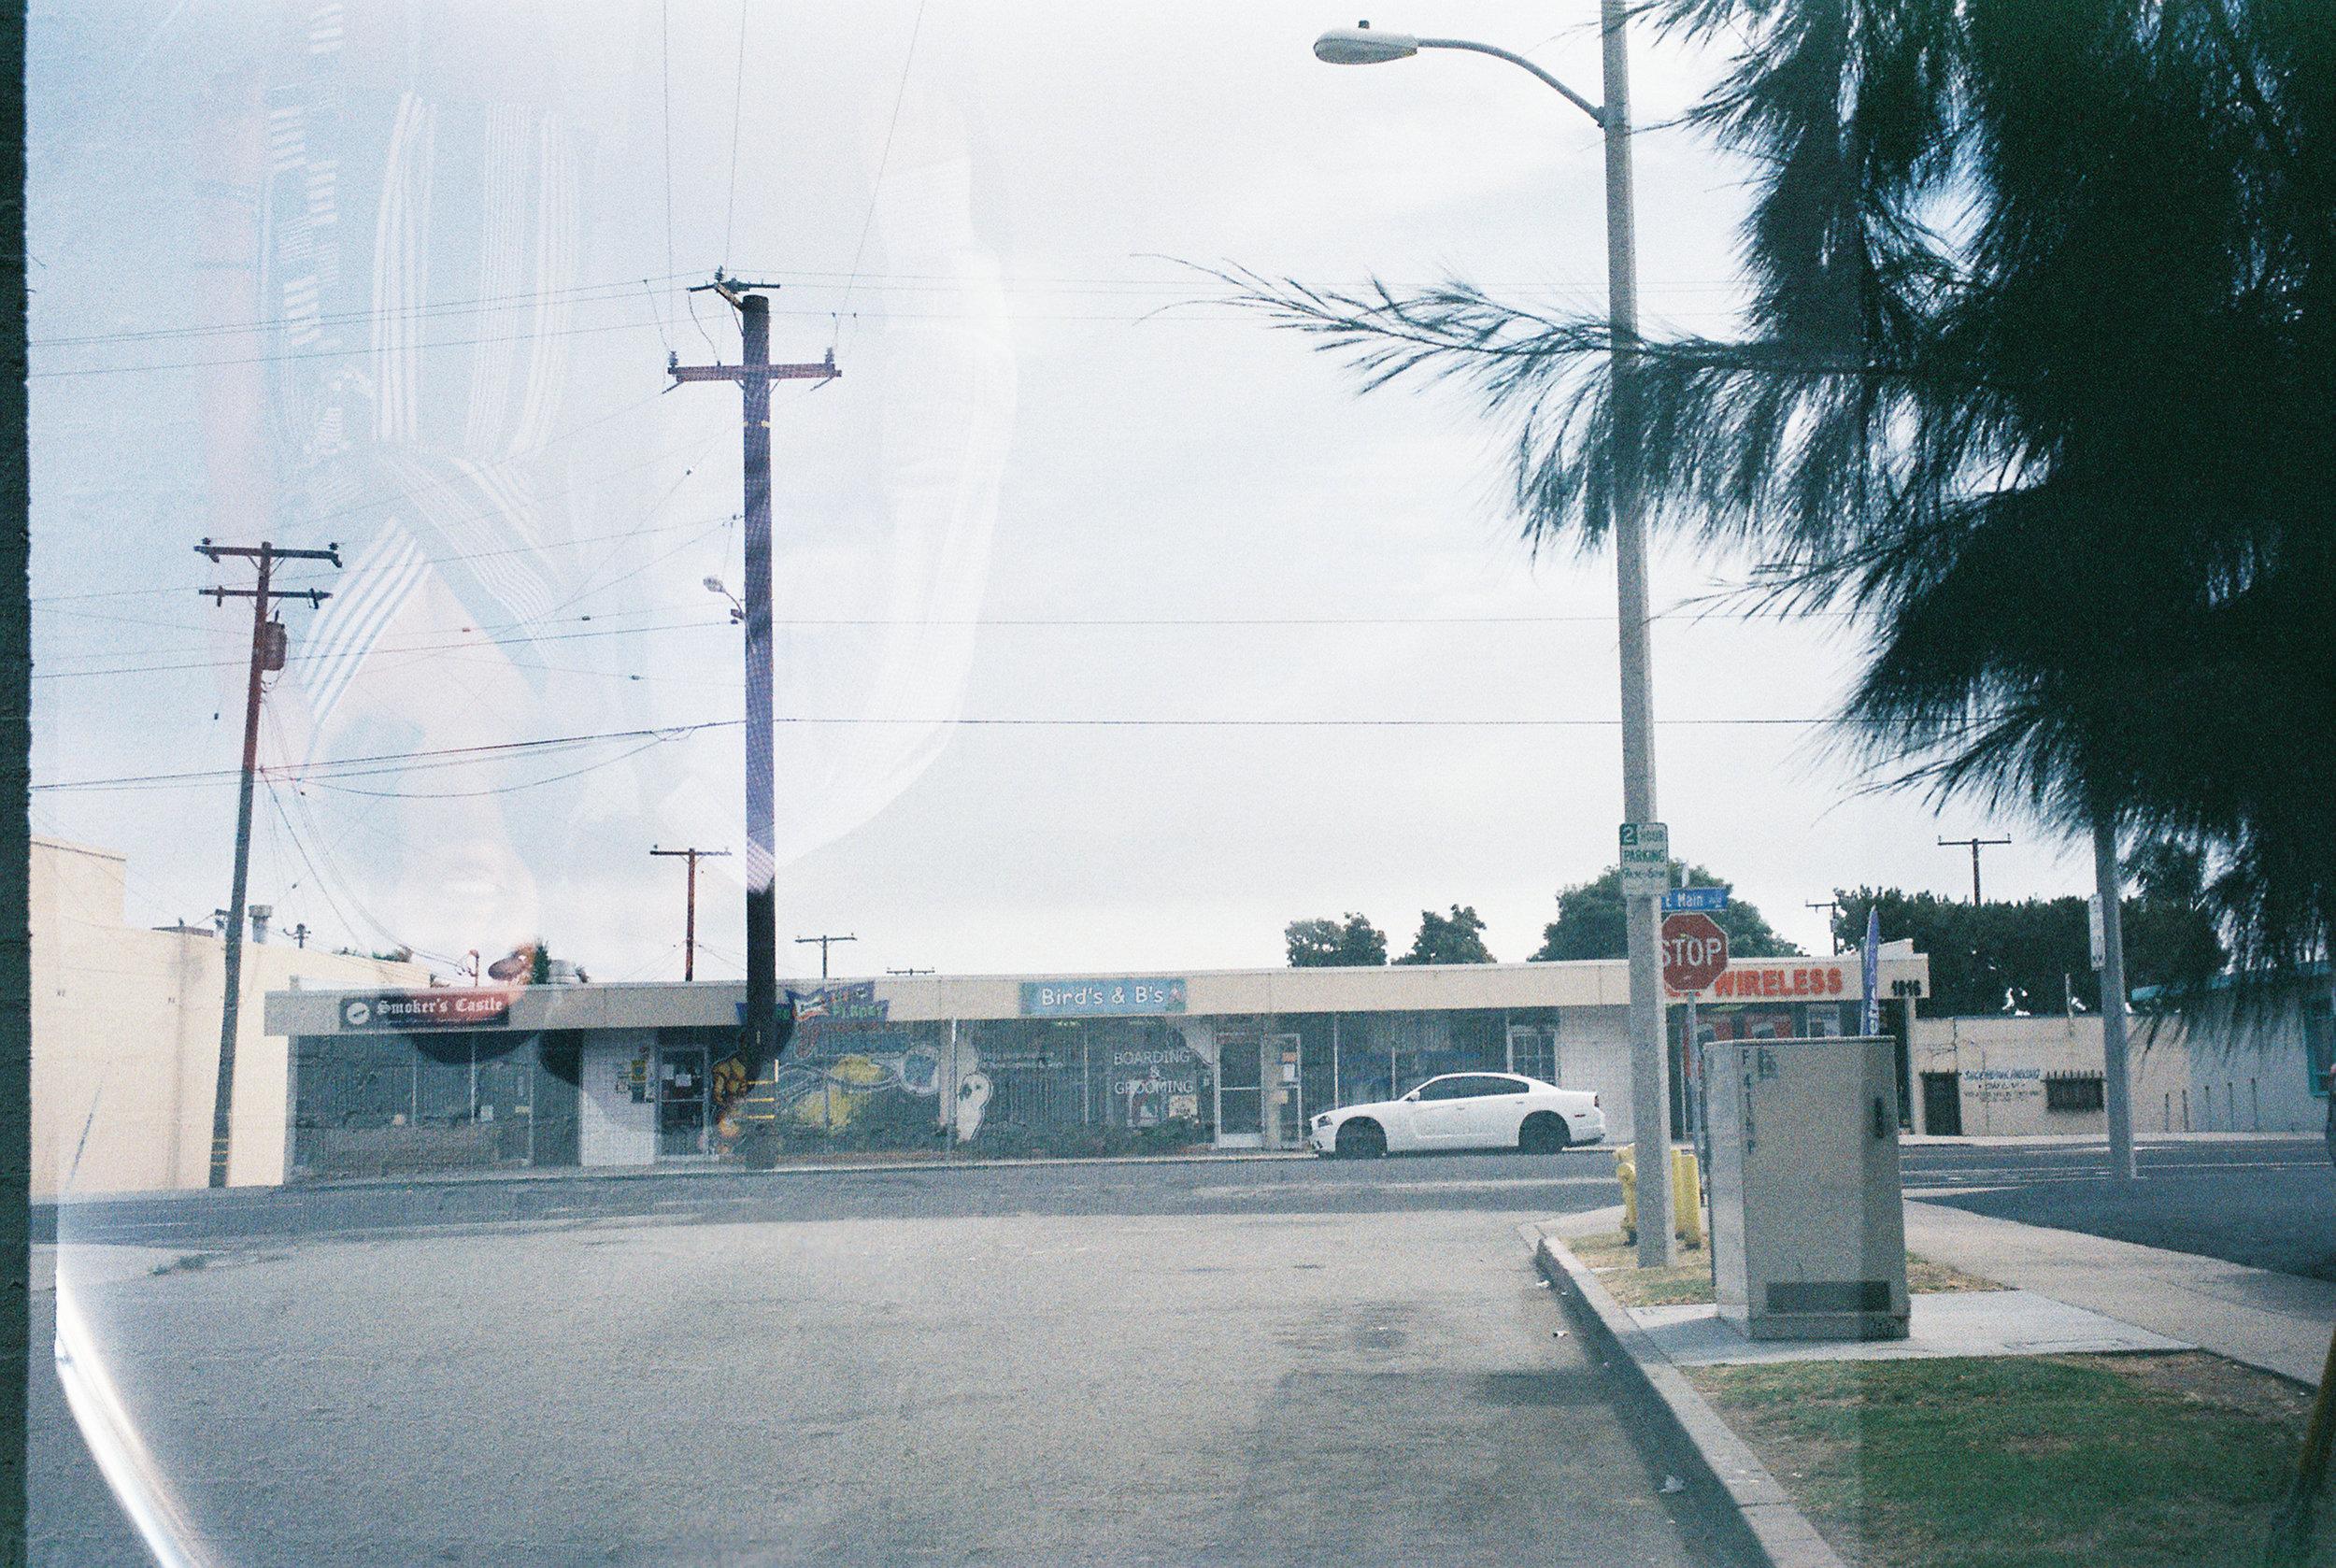 35mm Film-0001.jpg